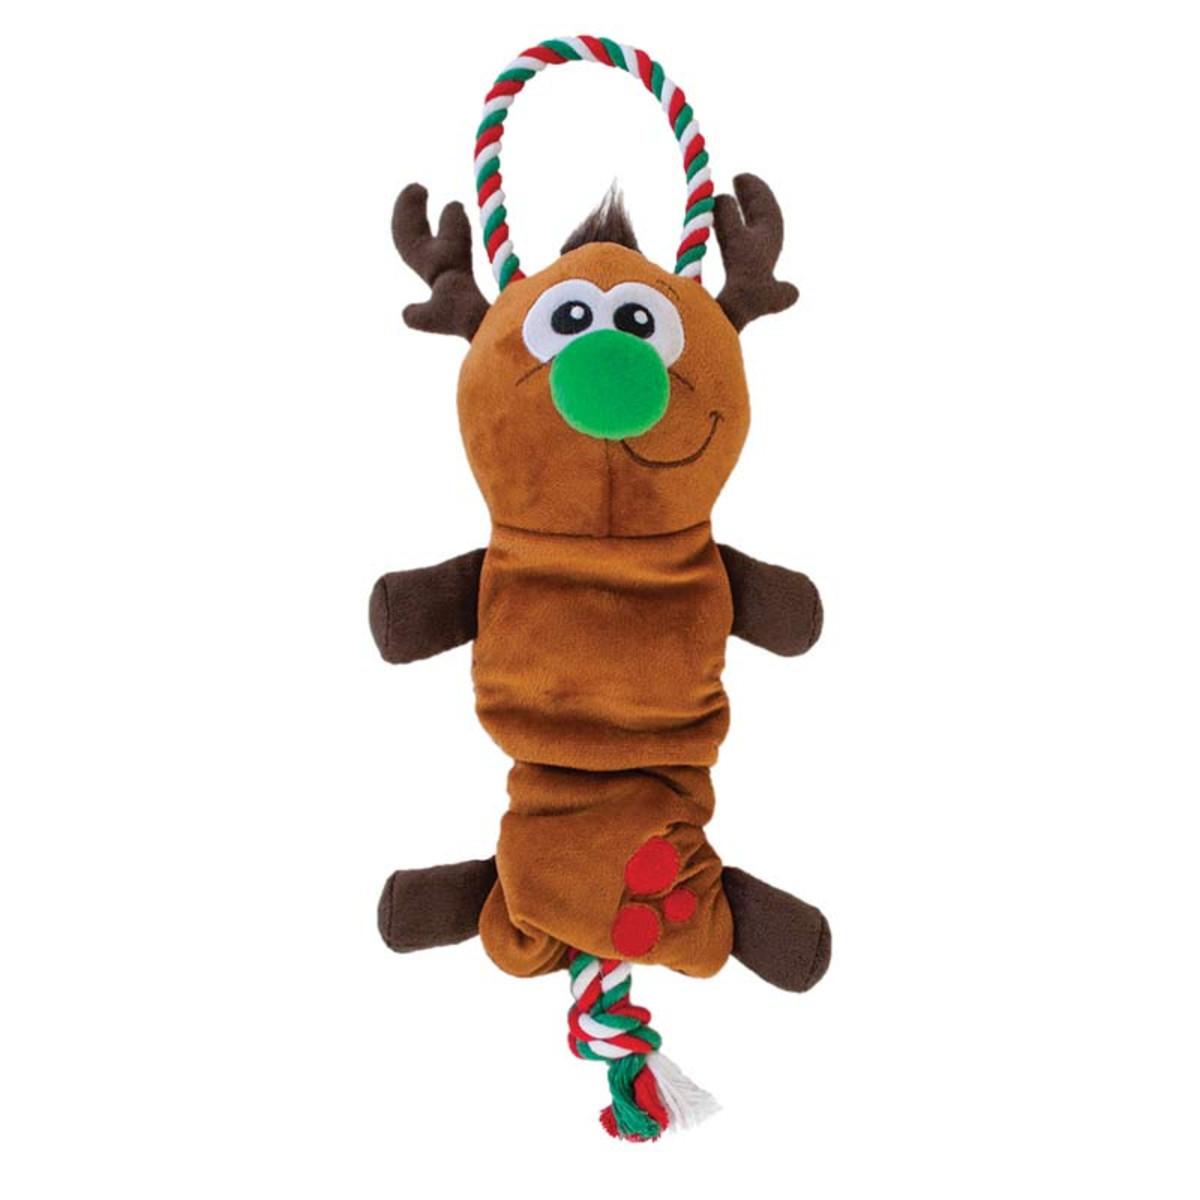 Outward Hound Flingerz Reindeer Tug Toy for Medium Dogs